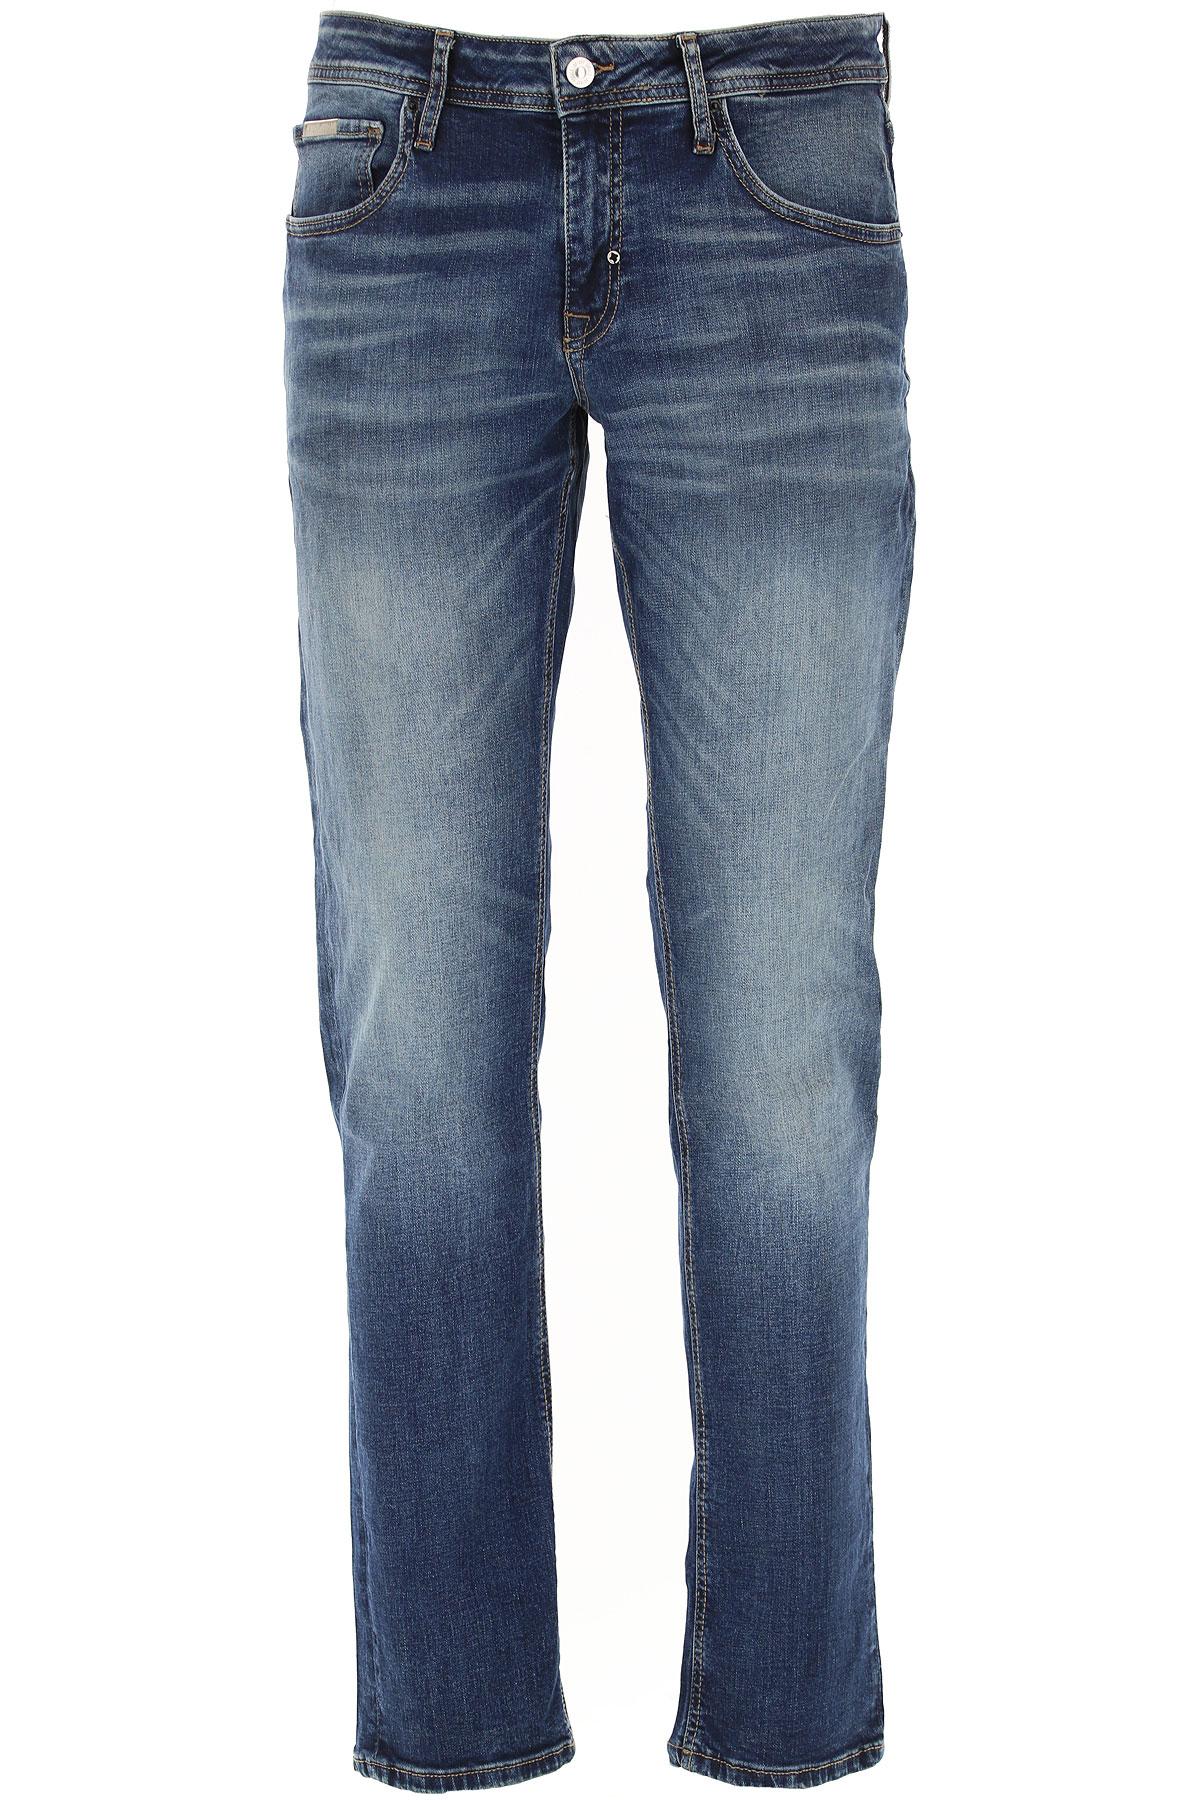 Antony Morato Jeans On Sale, Denim Blue, Cotton, 2019, 31 32 36 38